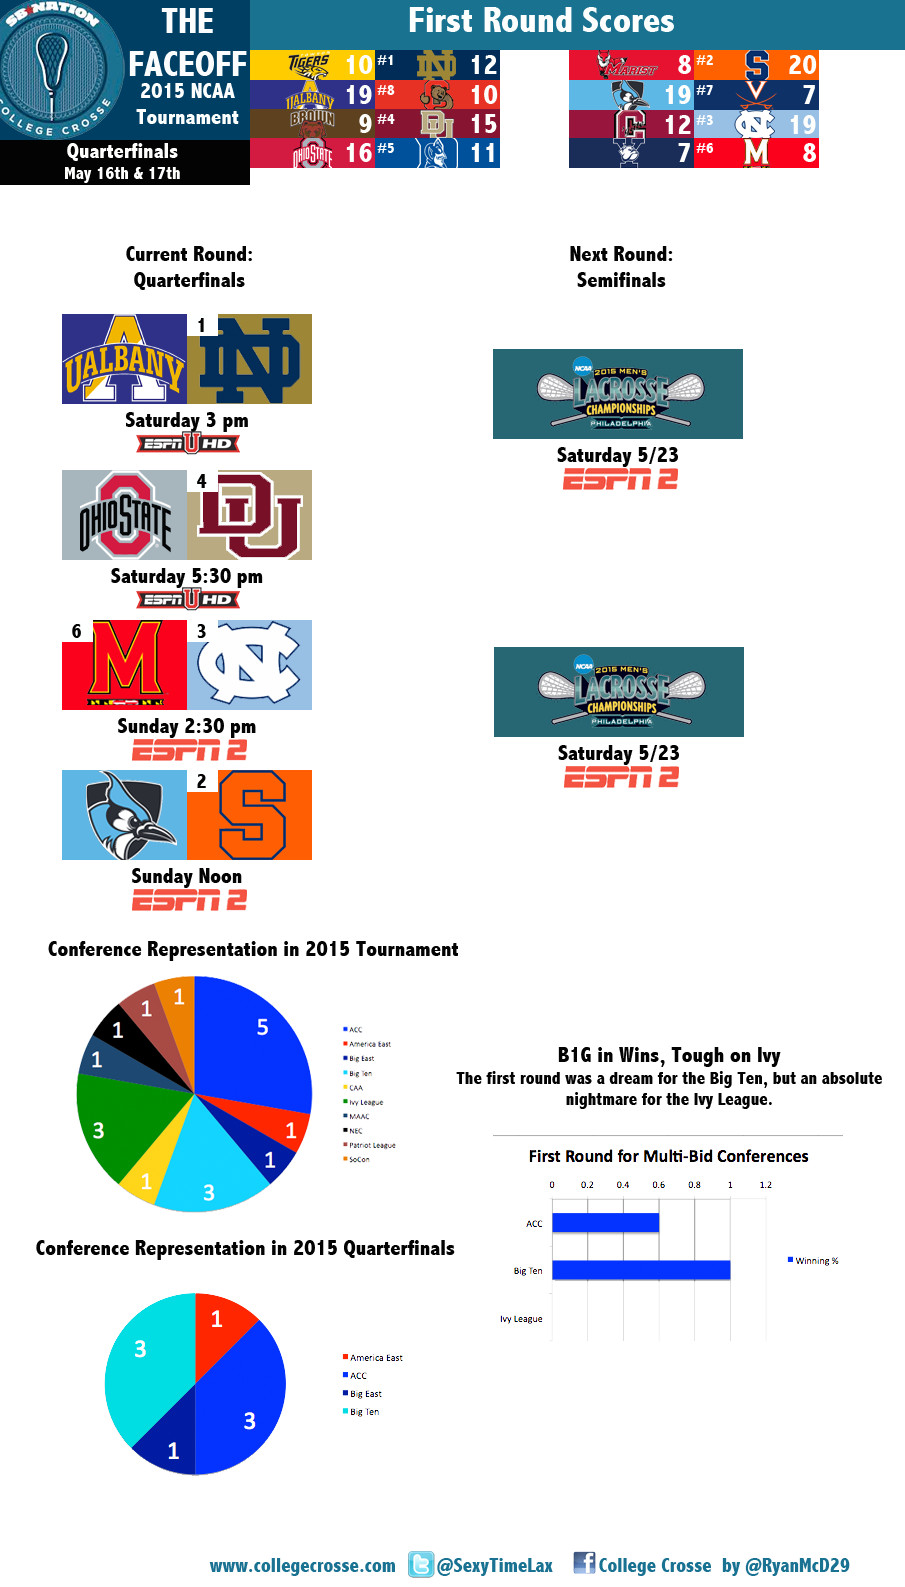 THE FACEOFF 2015 NCAA Quarterfinals